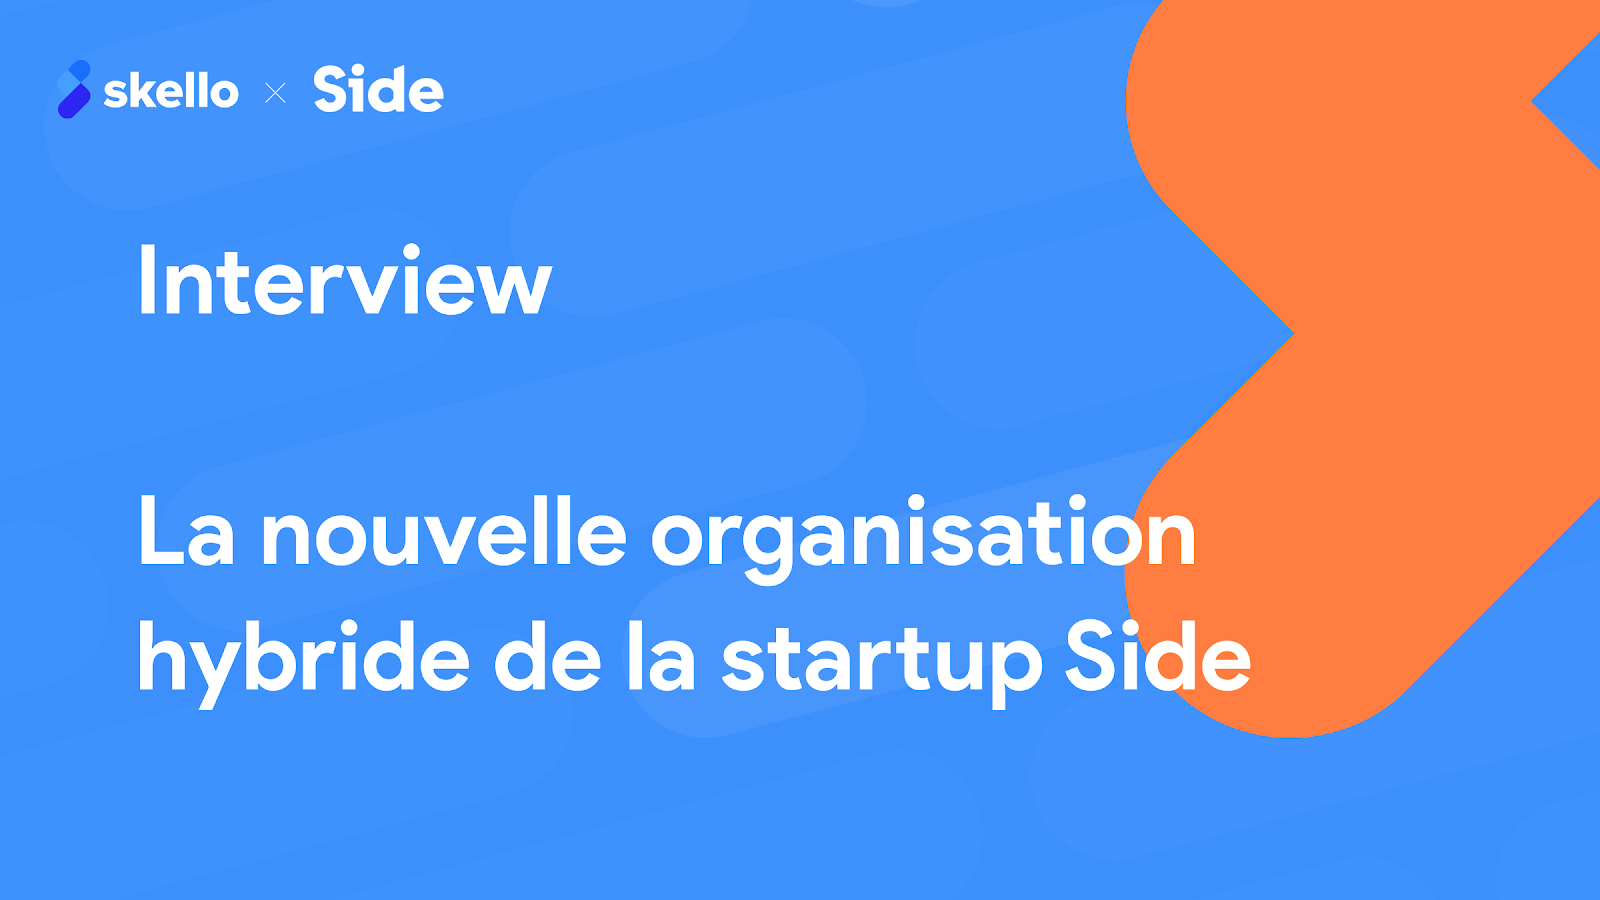 Interview: la nouvelle organisation hybride de la startup Side